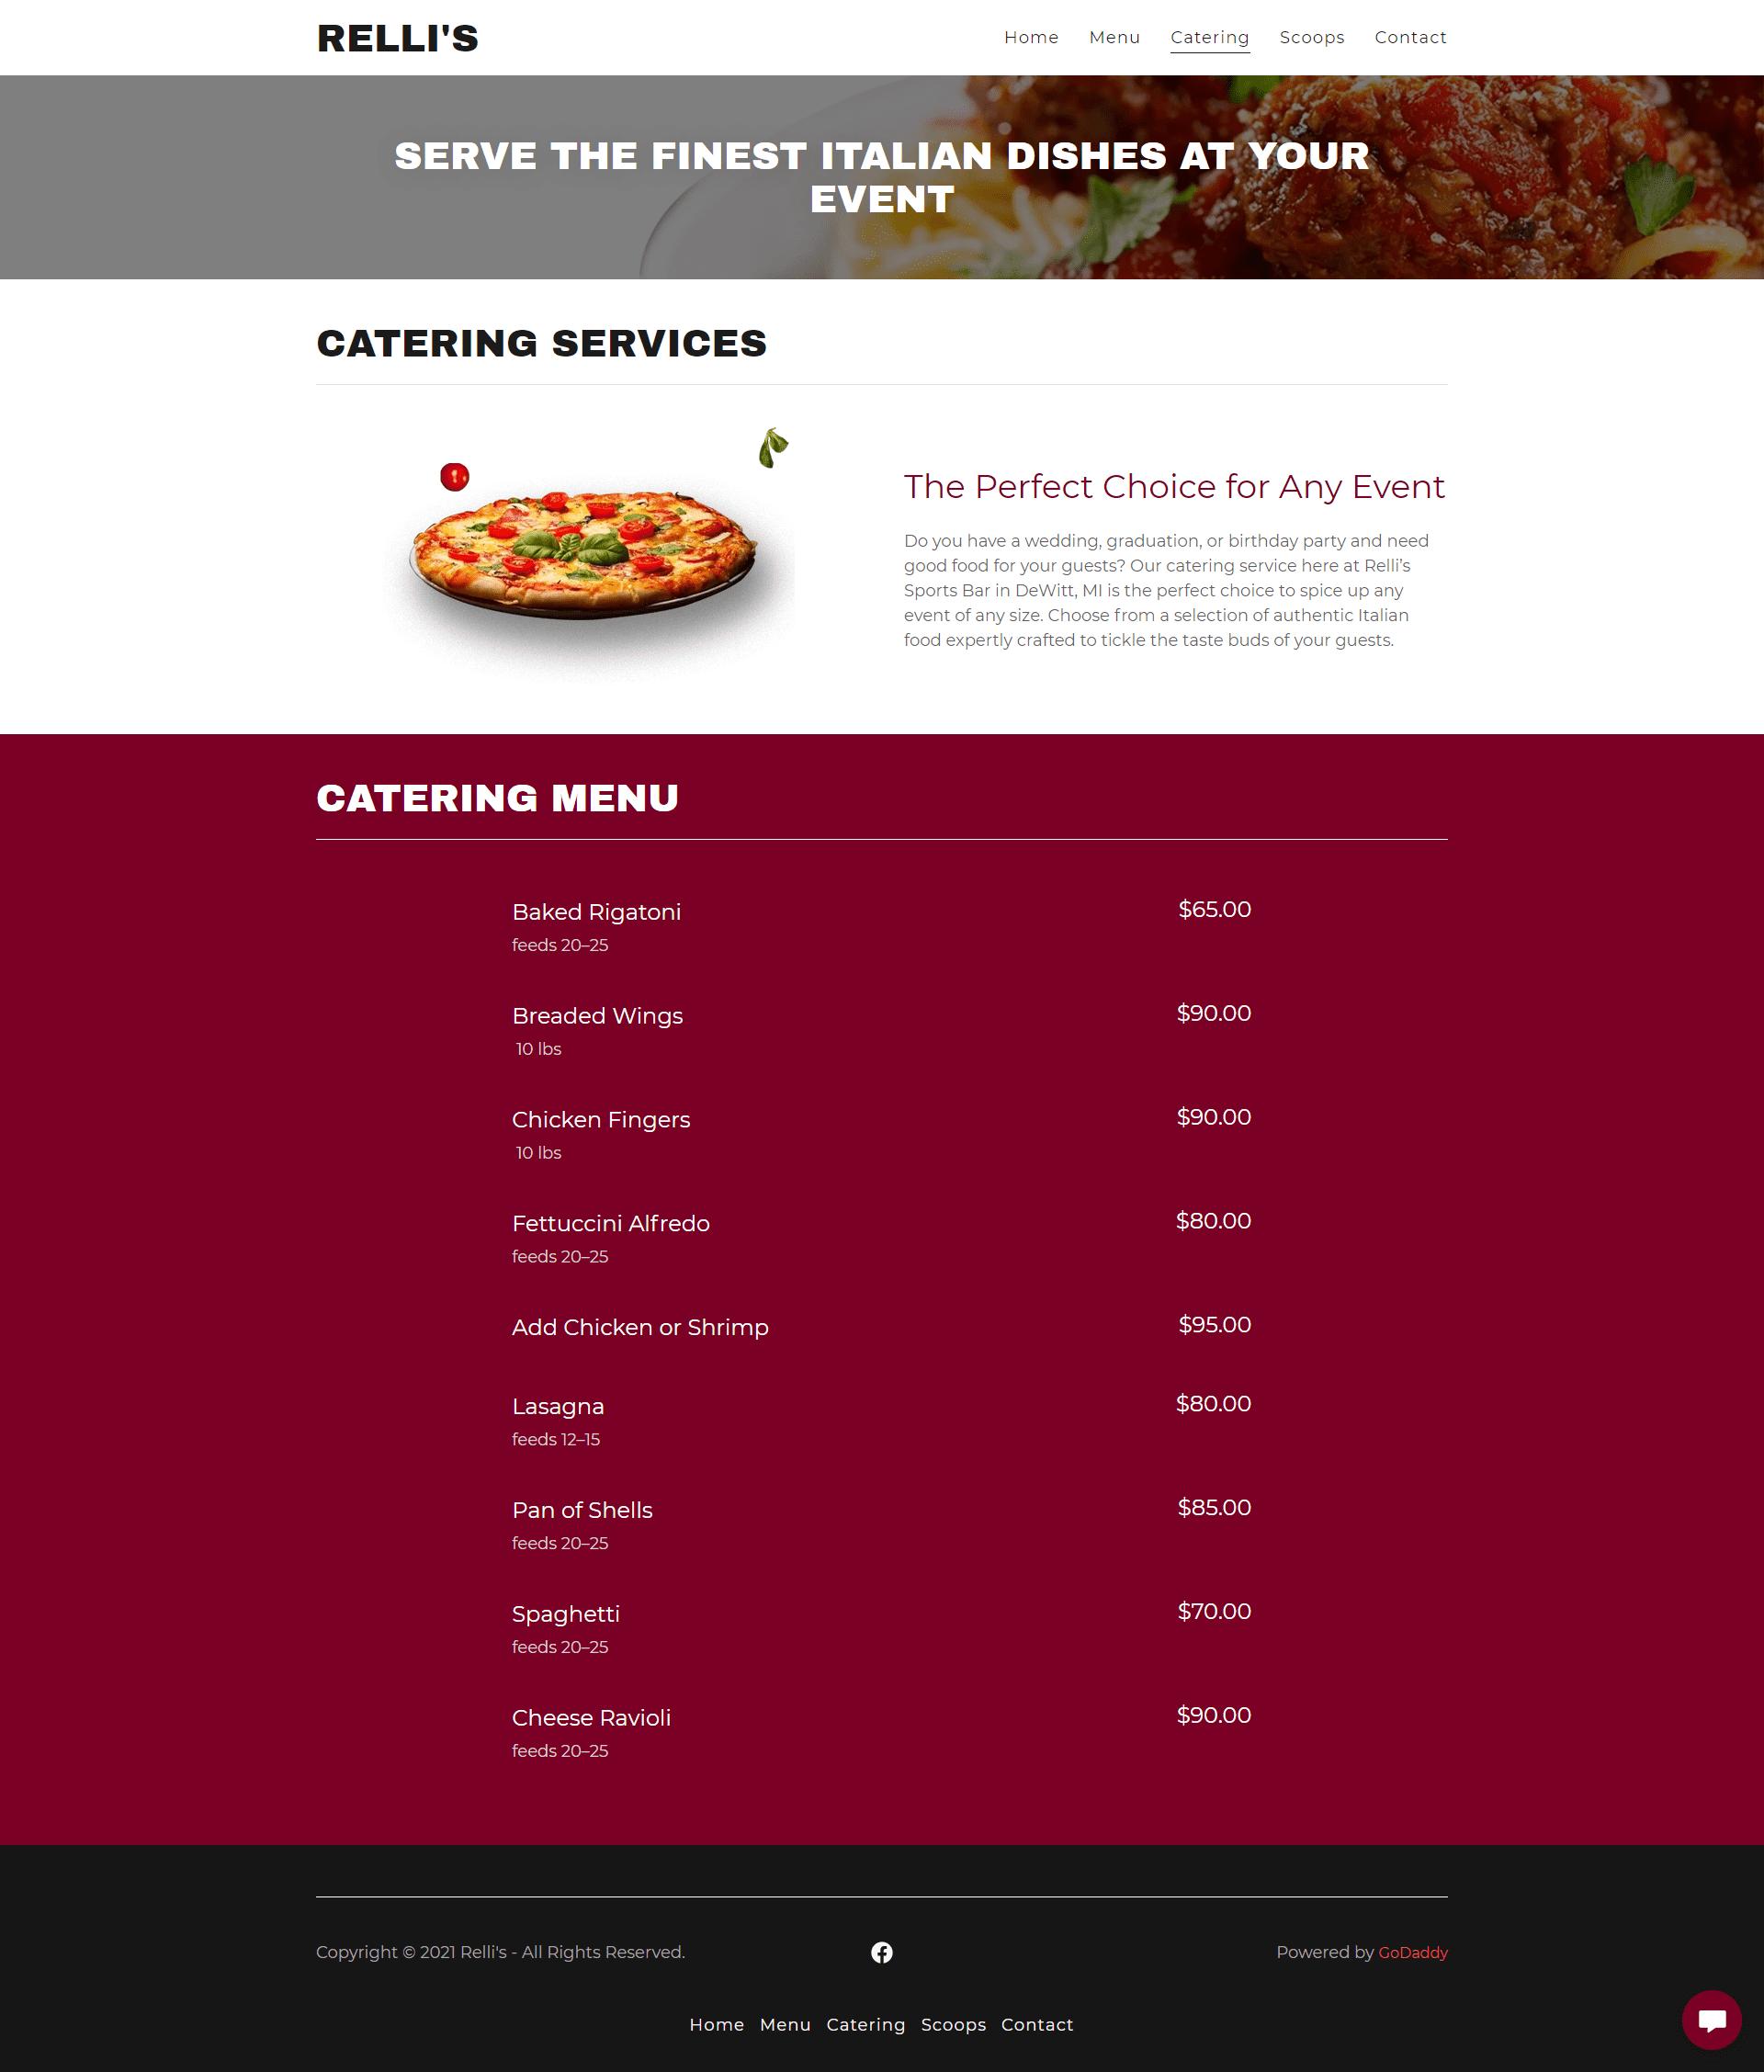 httpsrellis.godaddysites.com catering